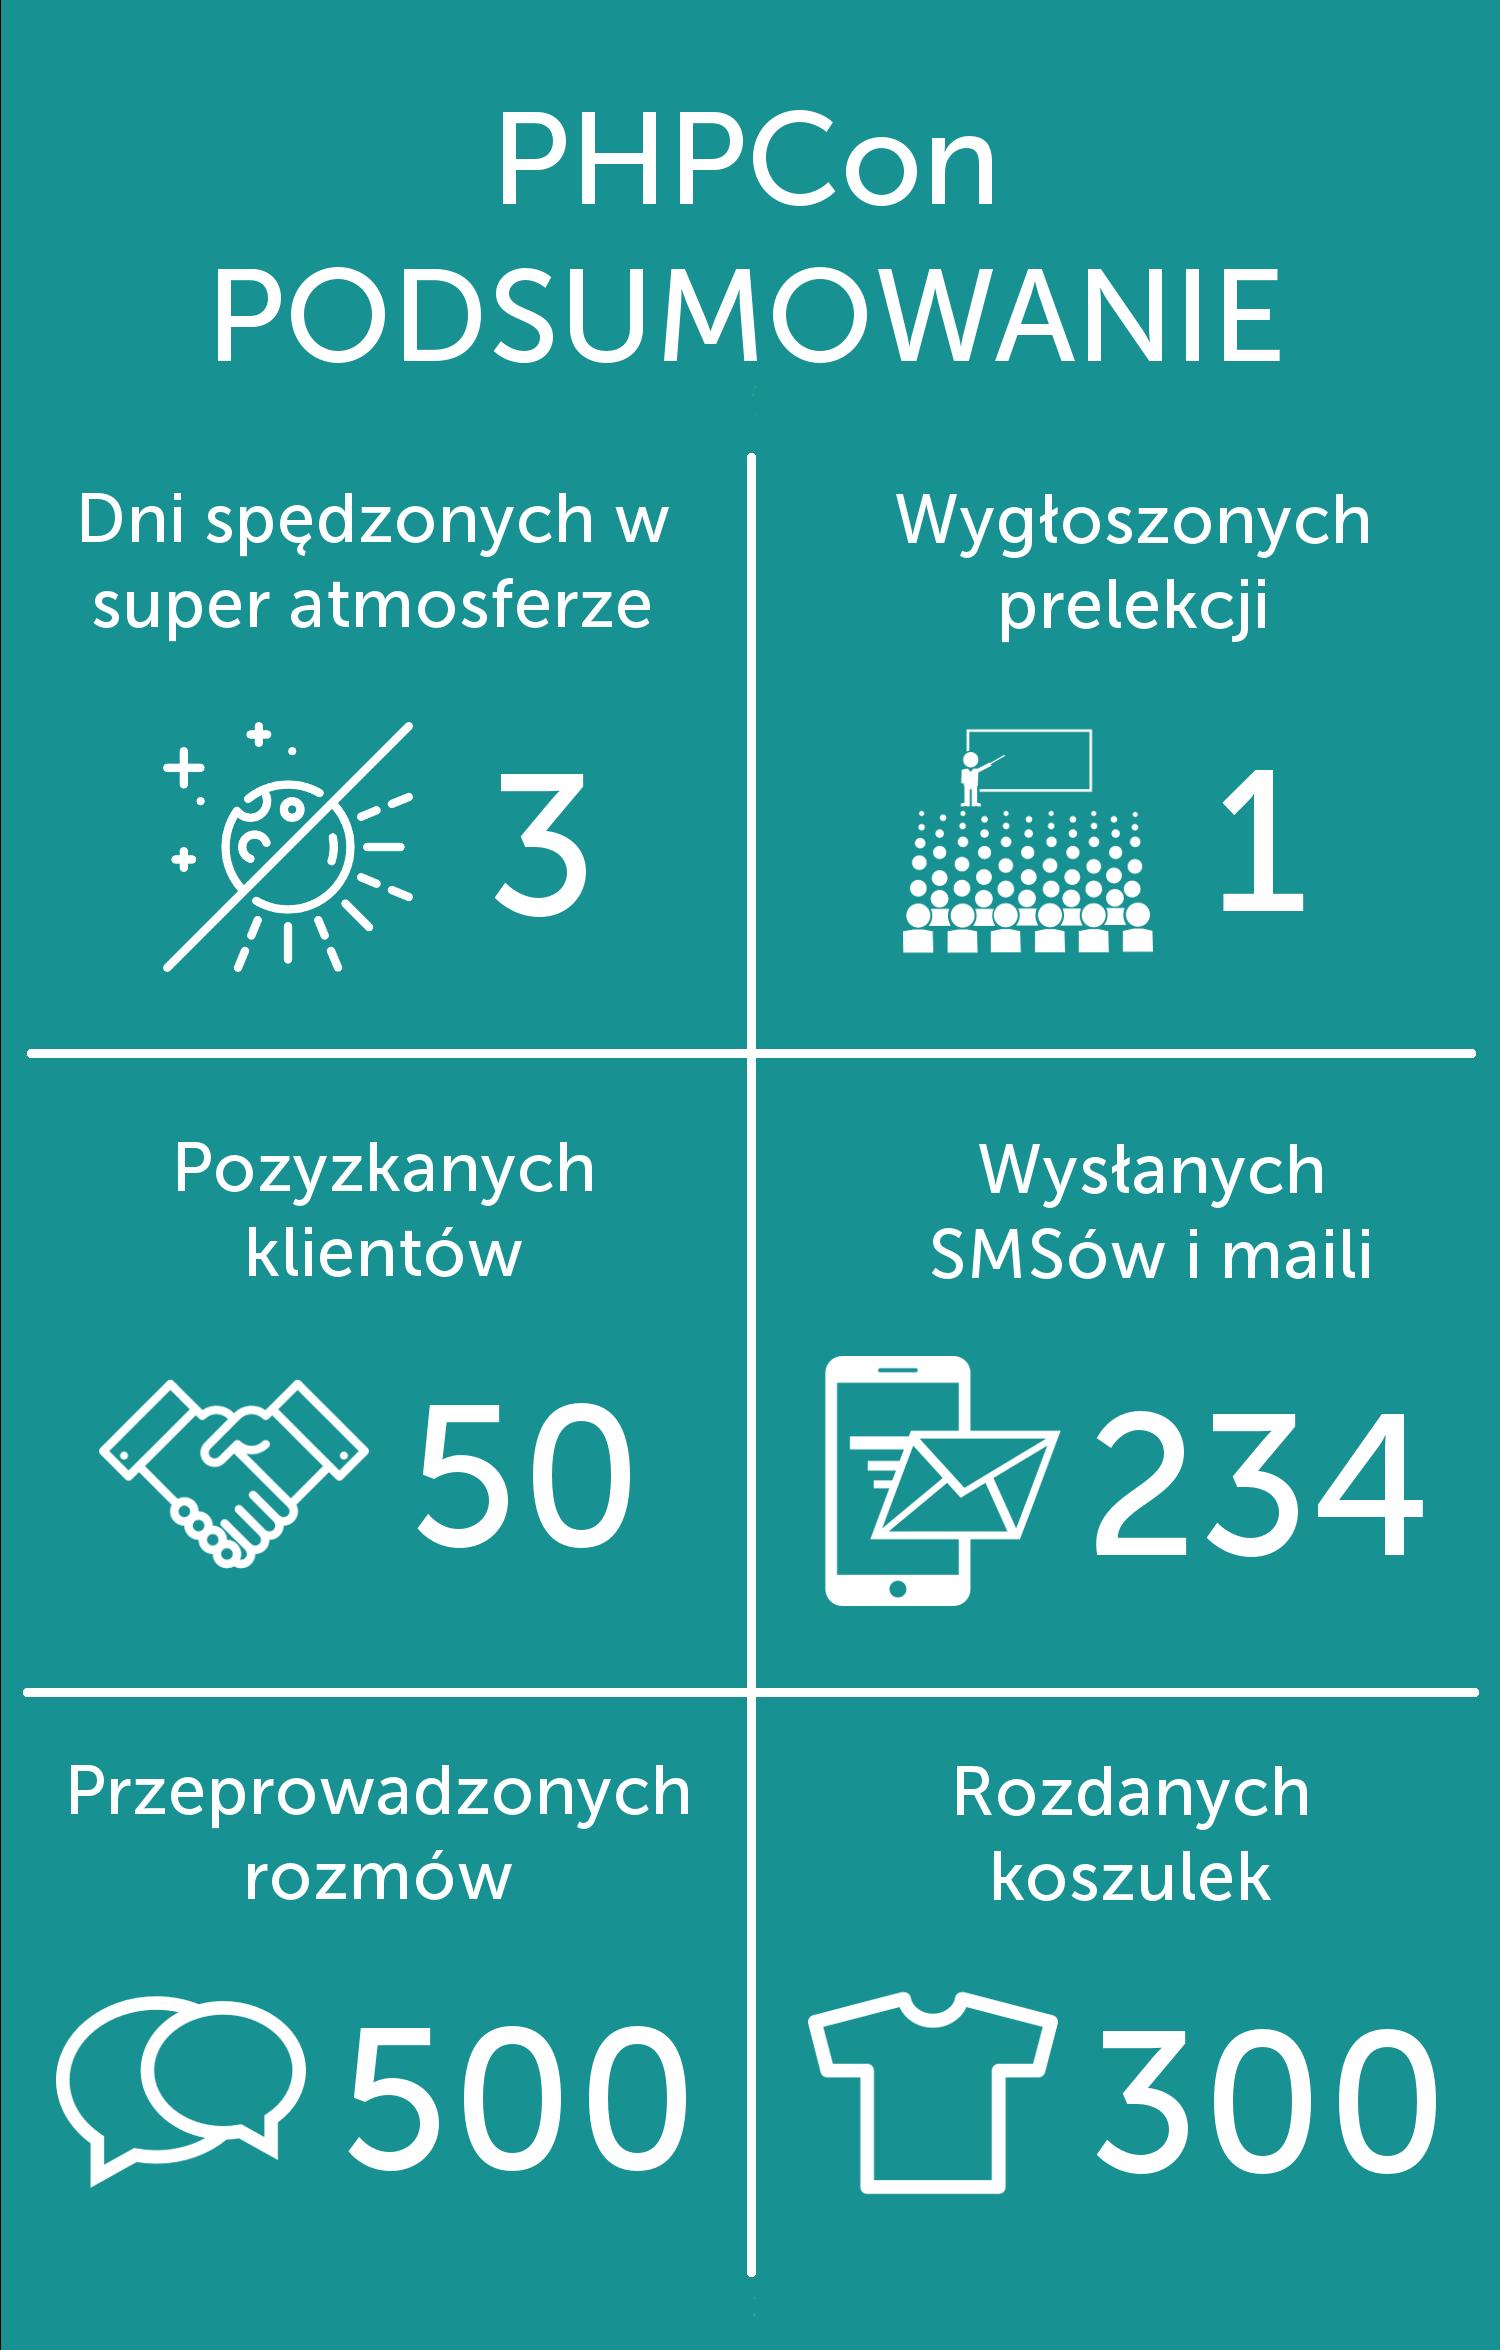 PHPCon POLAND 2016 JUŻ ZA NAMI